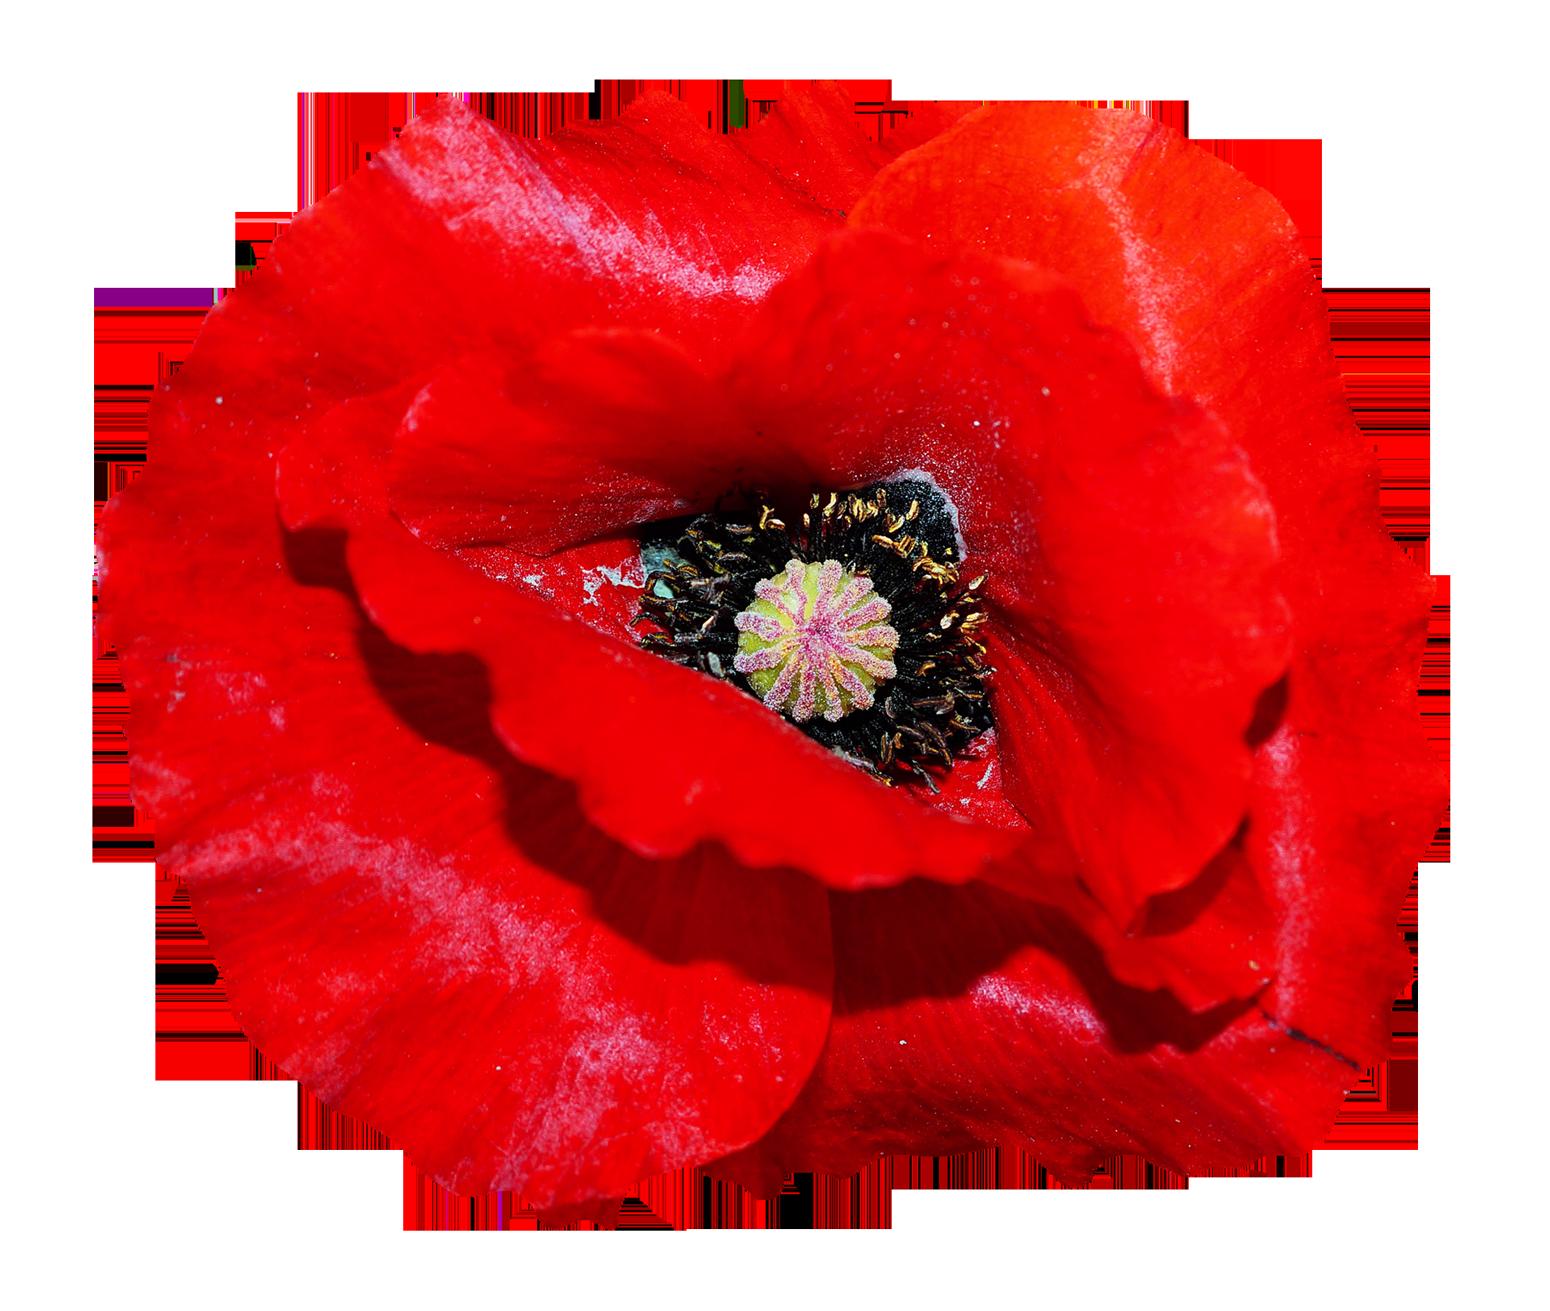 Poppy Flower PNG Image.